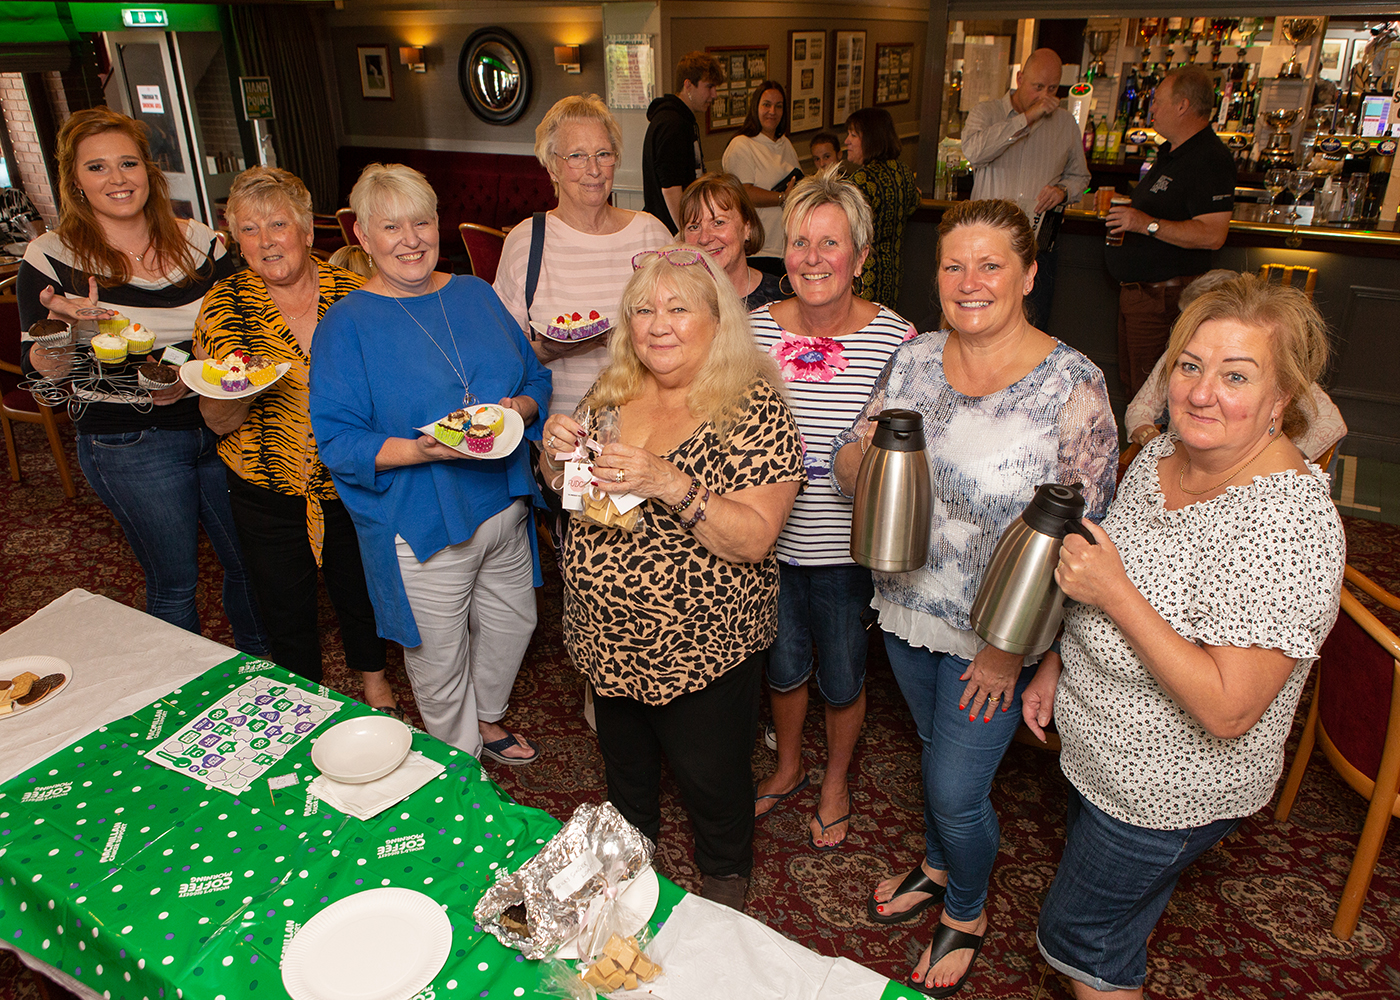 Macmillan Coffee Morning raises over £900